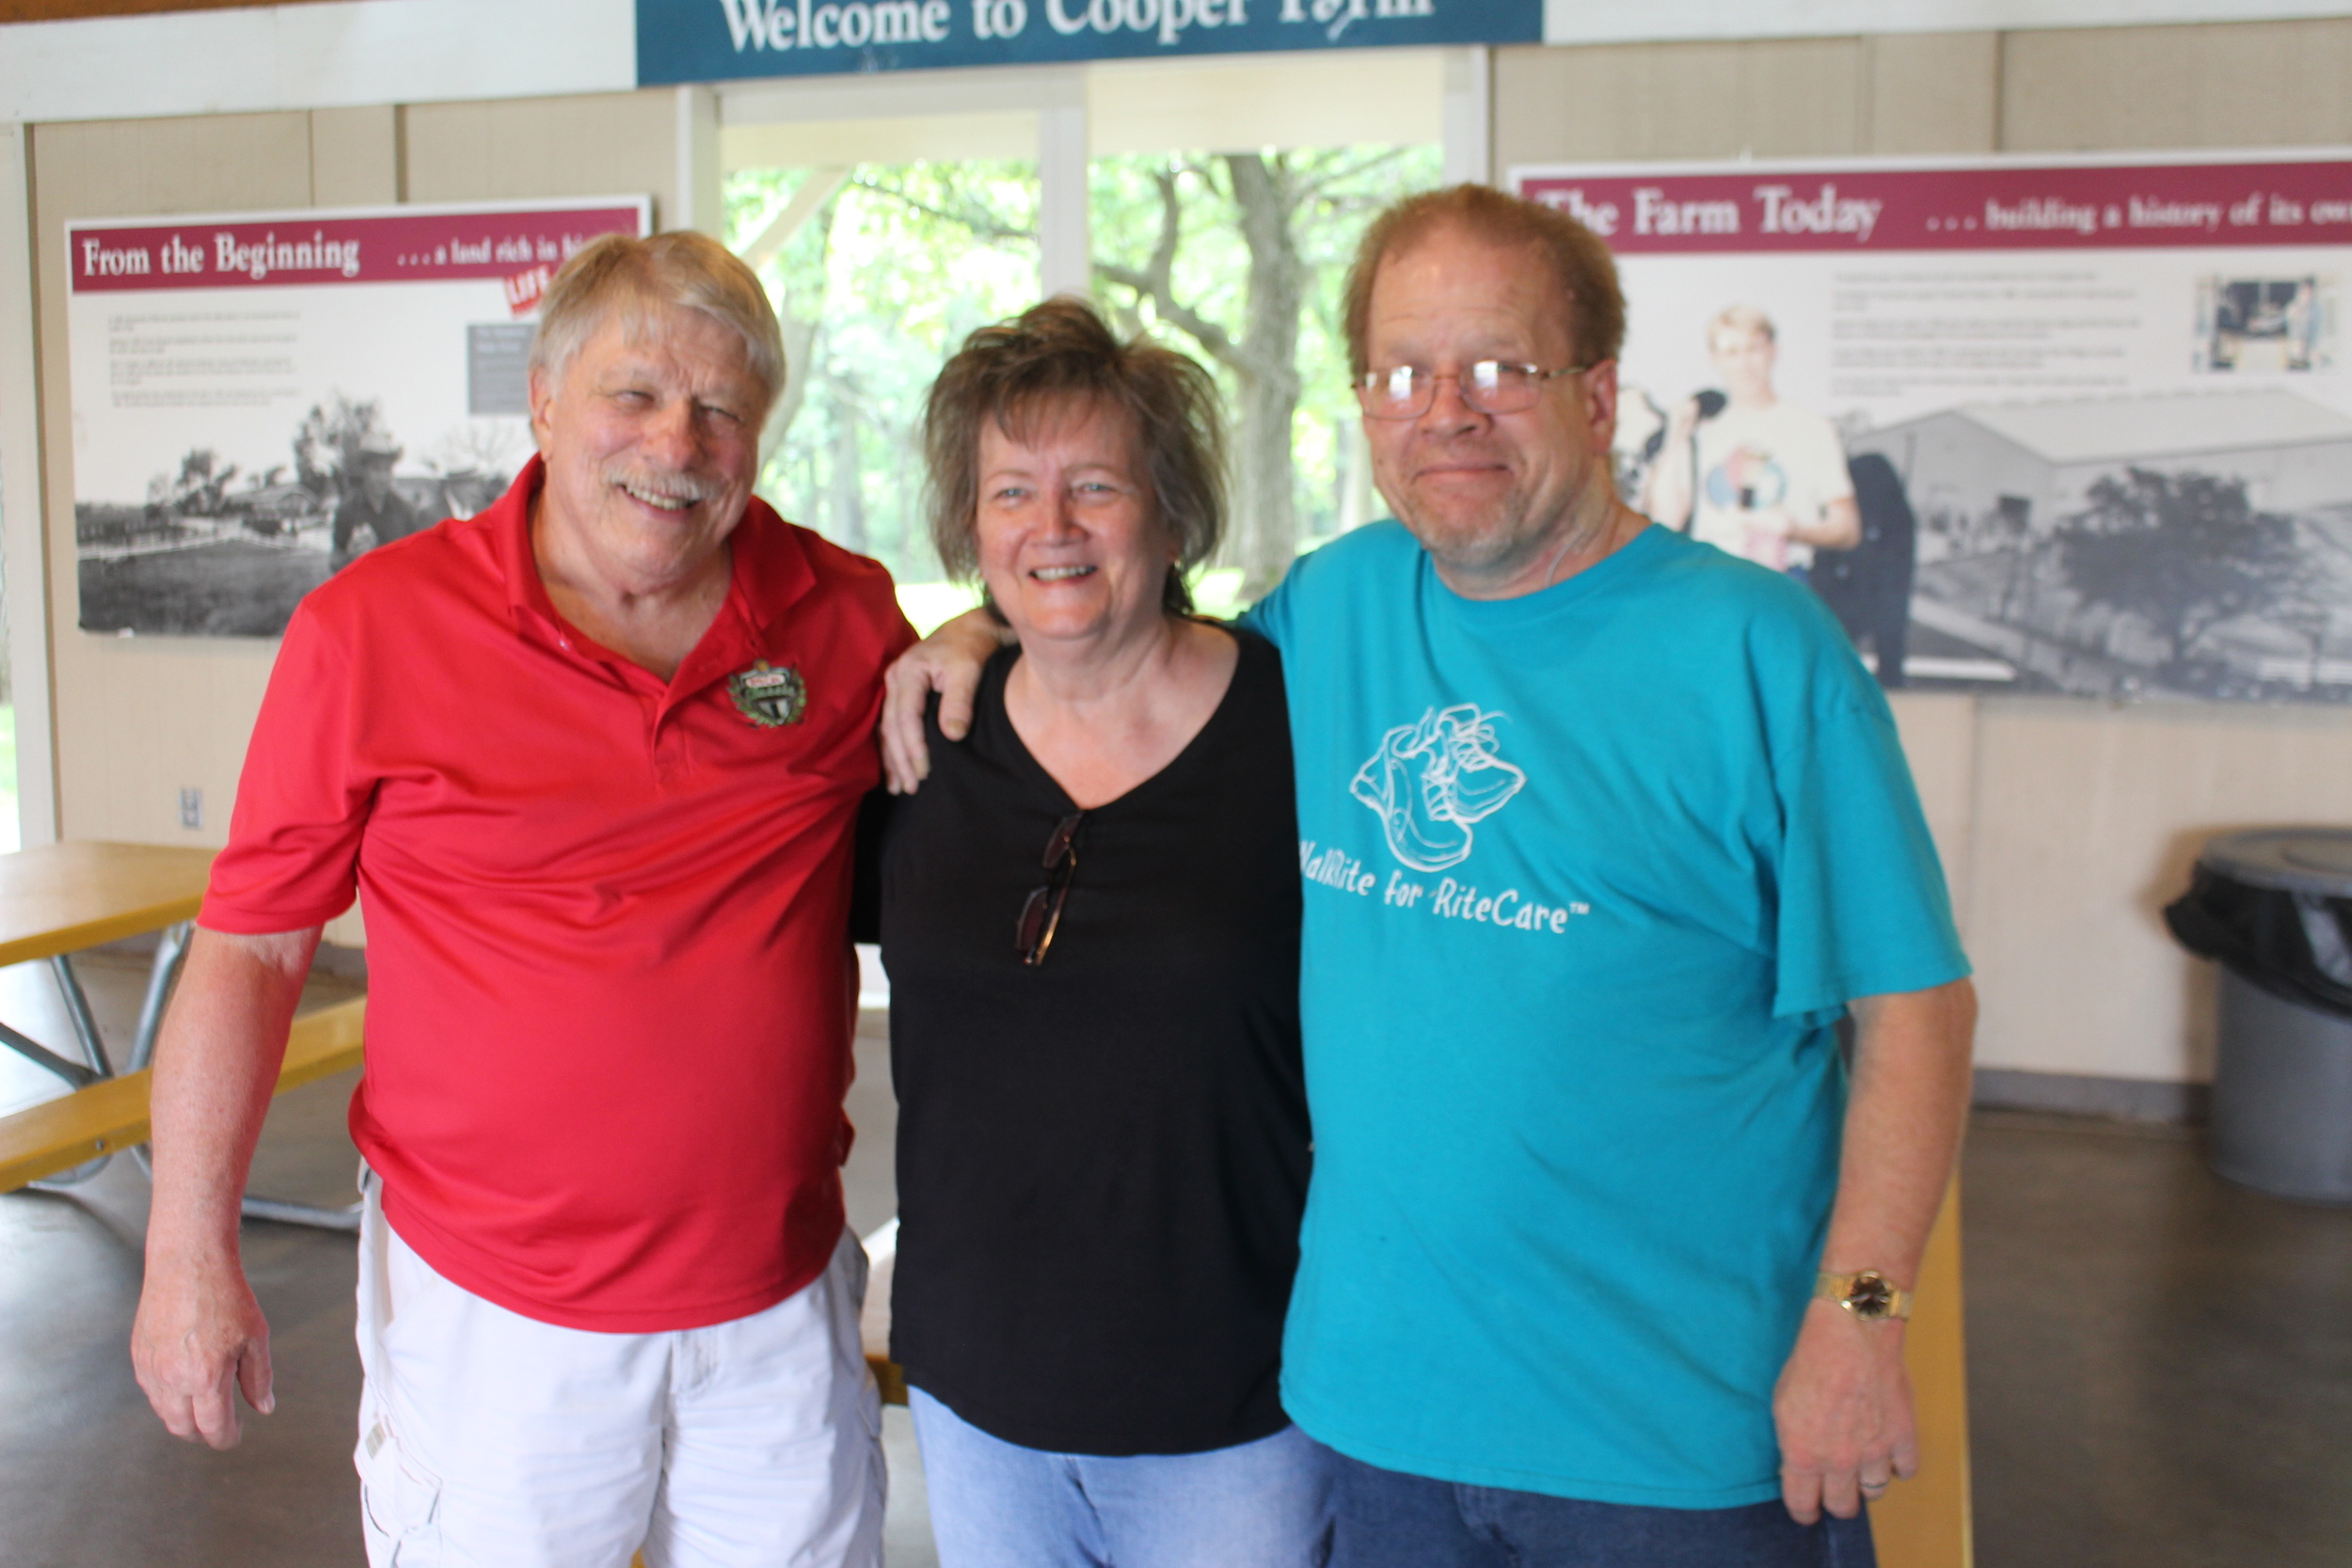 Jim, Peggy, and Scott Beard